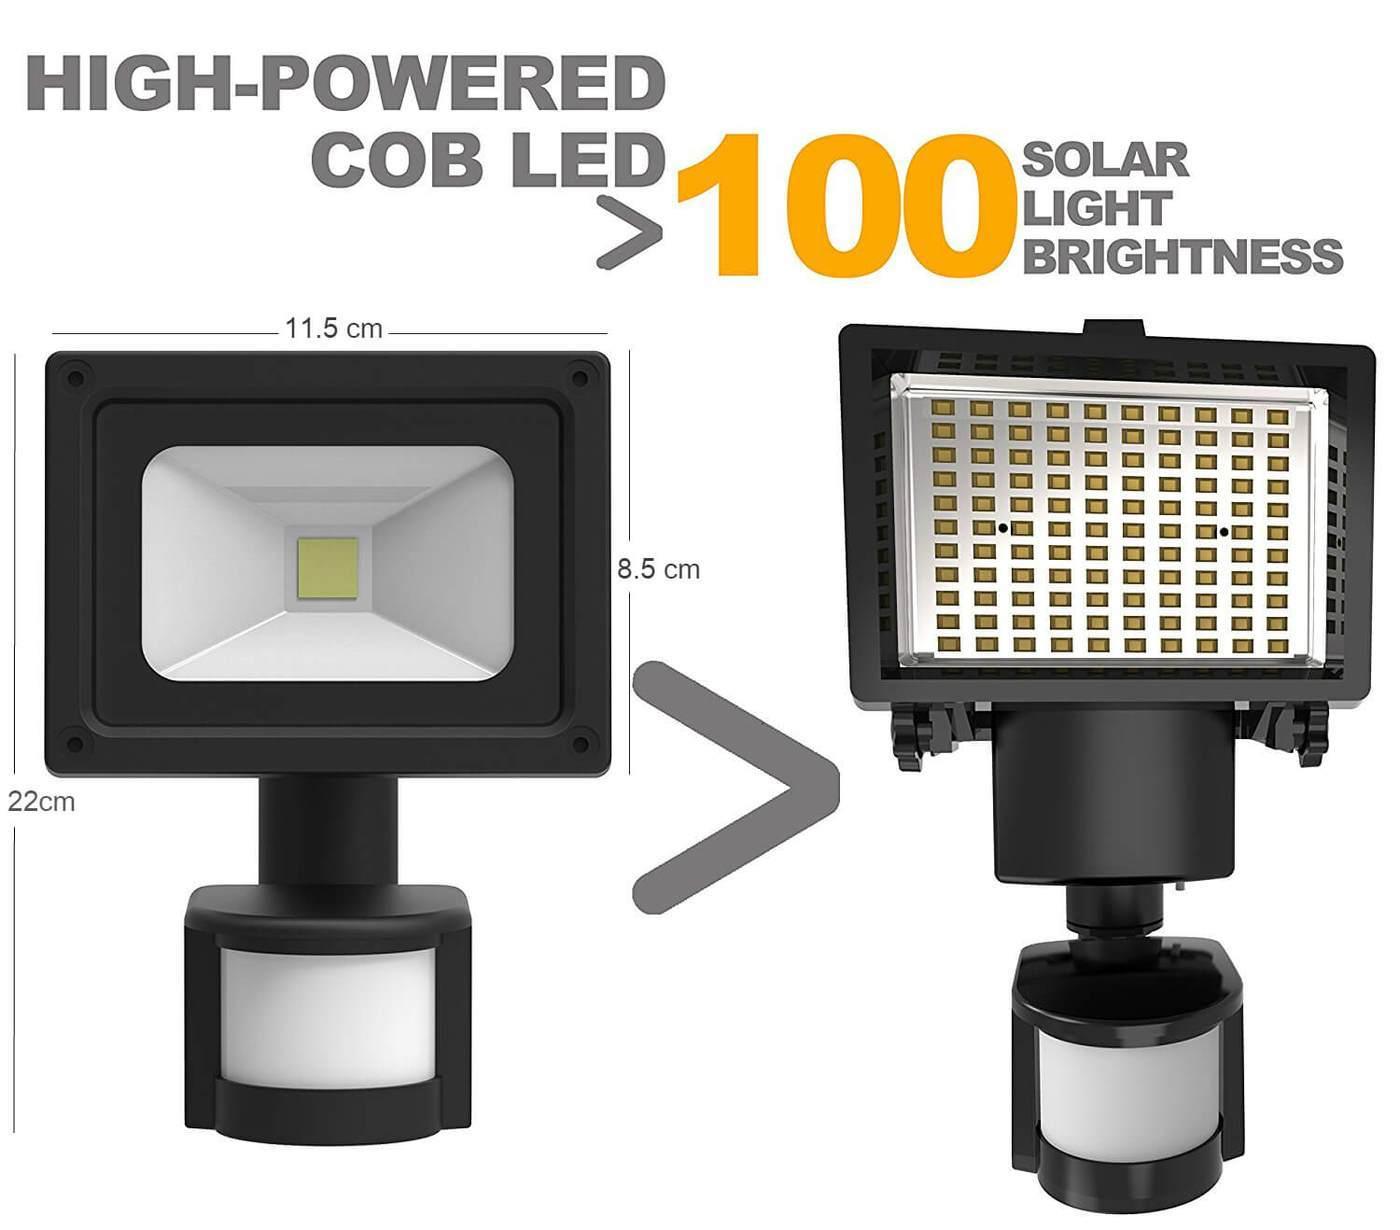 SOLAR 5W COB LED MOTION SENSOR SECURITY LAMP